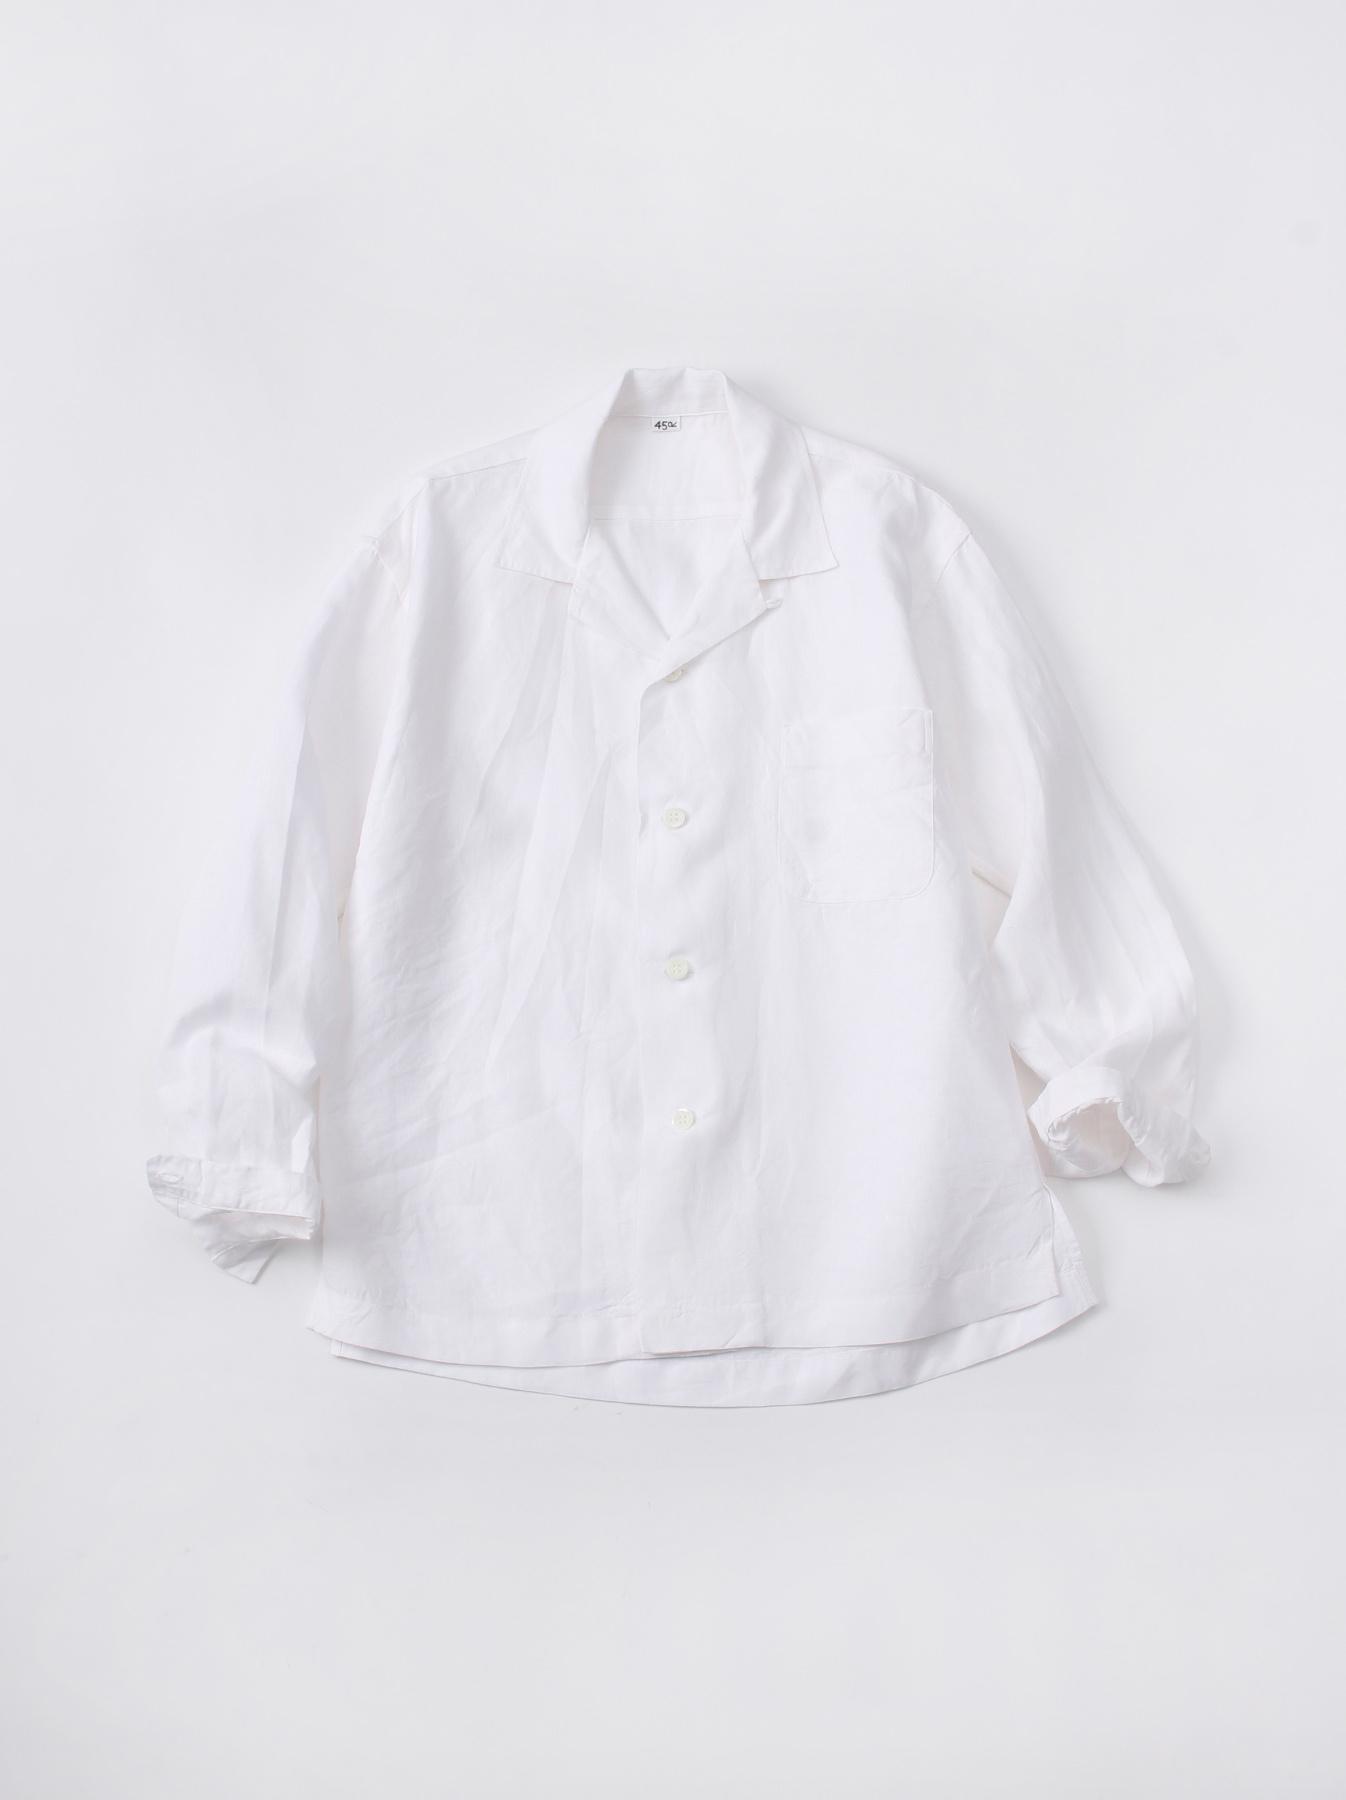 WH Piece-dyed Linen 908 Safari Shirt-2